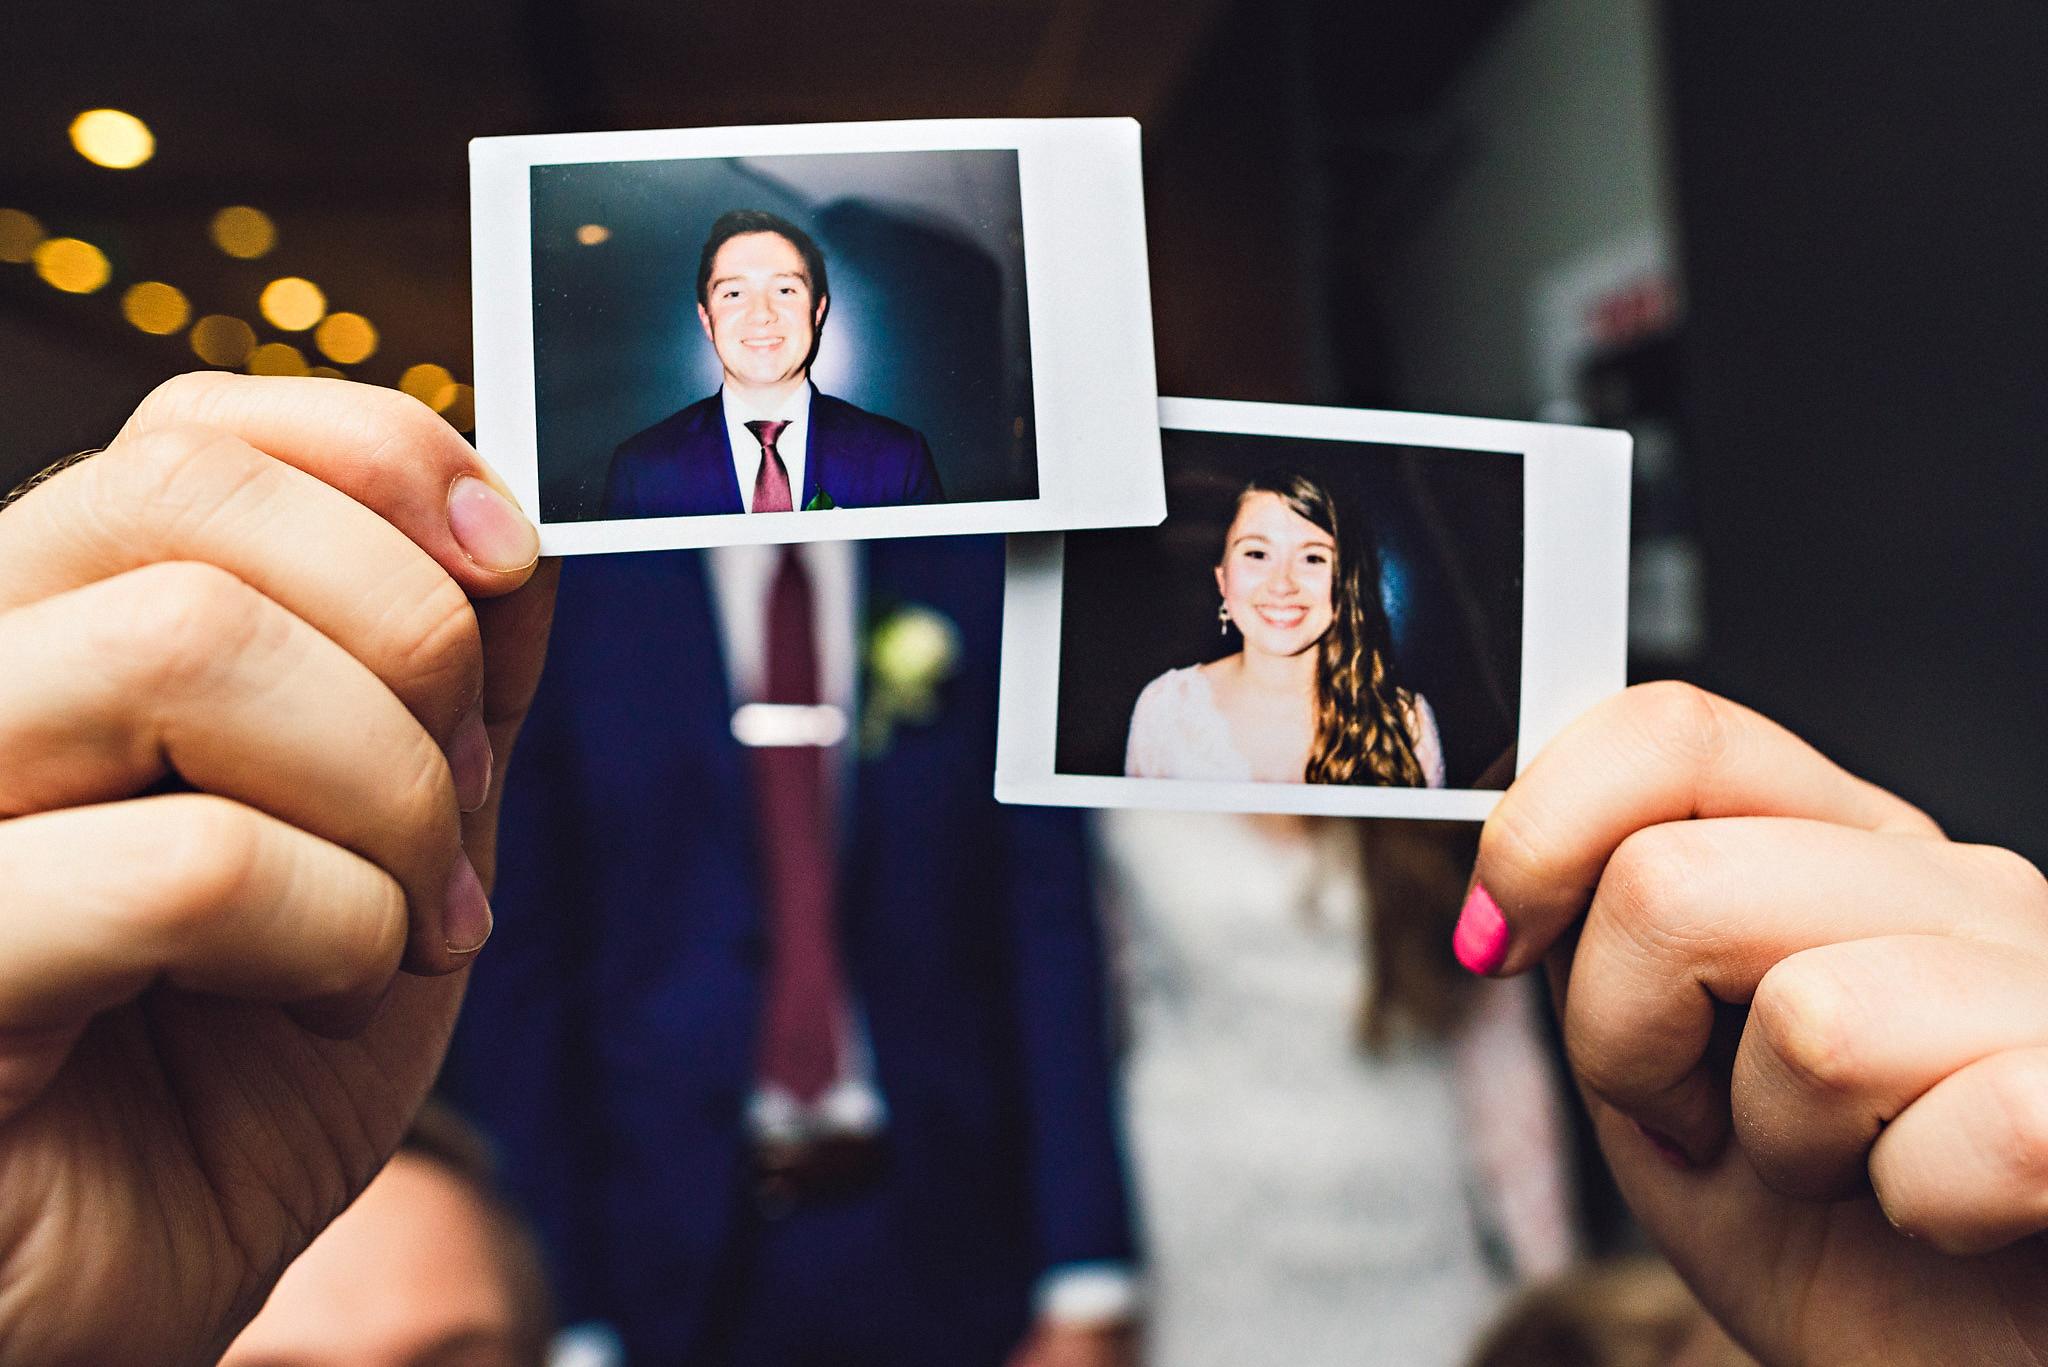 Eirik Halvorsen Blikkfangerne intervju bryllupsfotografer i norge 6.jpg